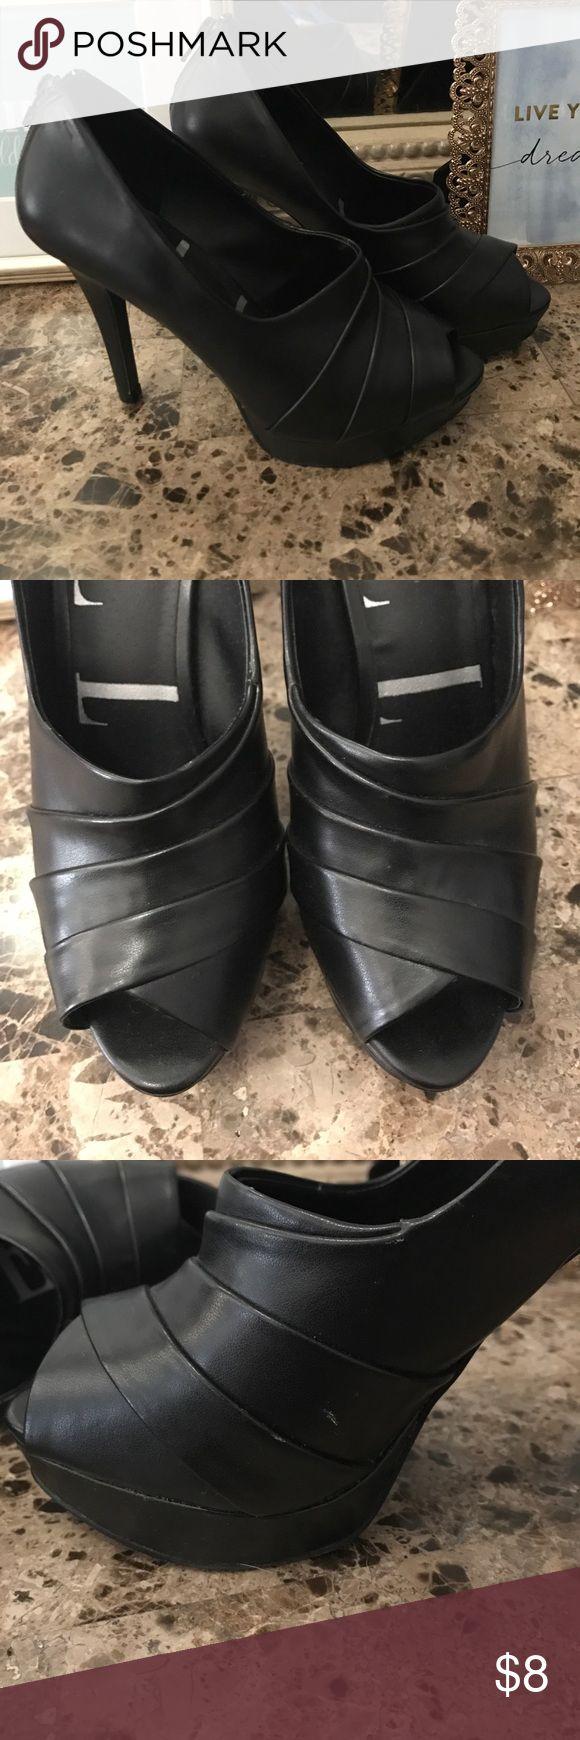 Elle peep toe heels Black peep toe heels. Worn once. Right heel has a white scuff mark as seen in pic Elle Shoes Heels